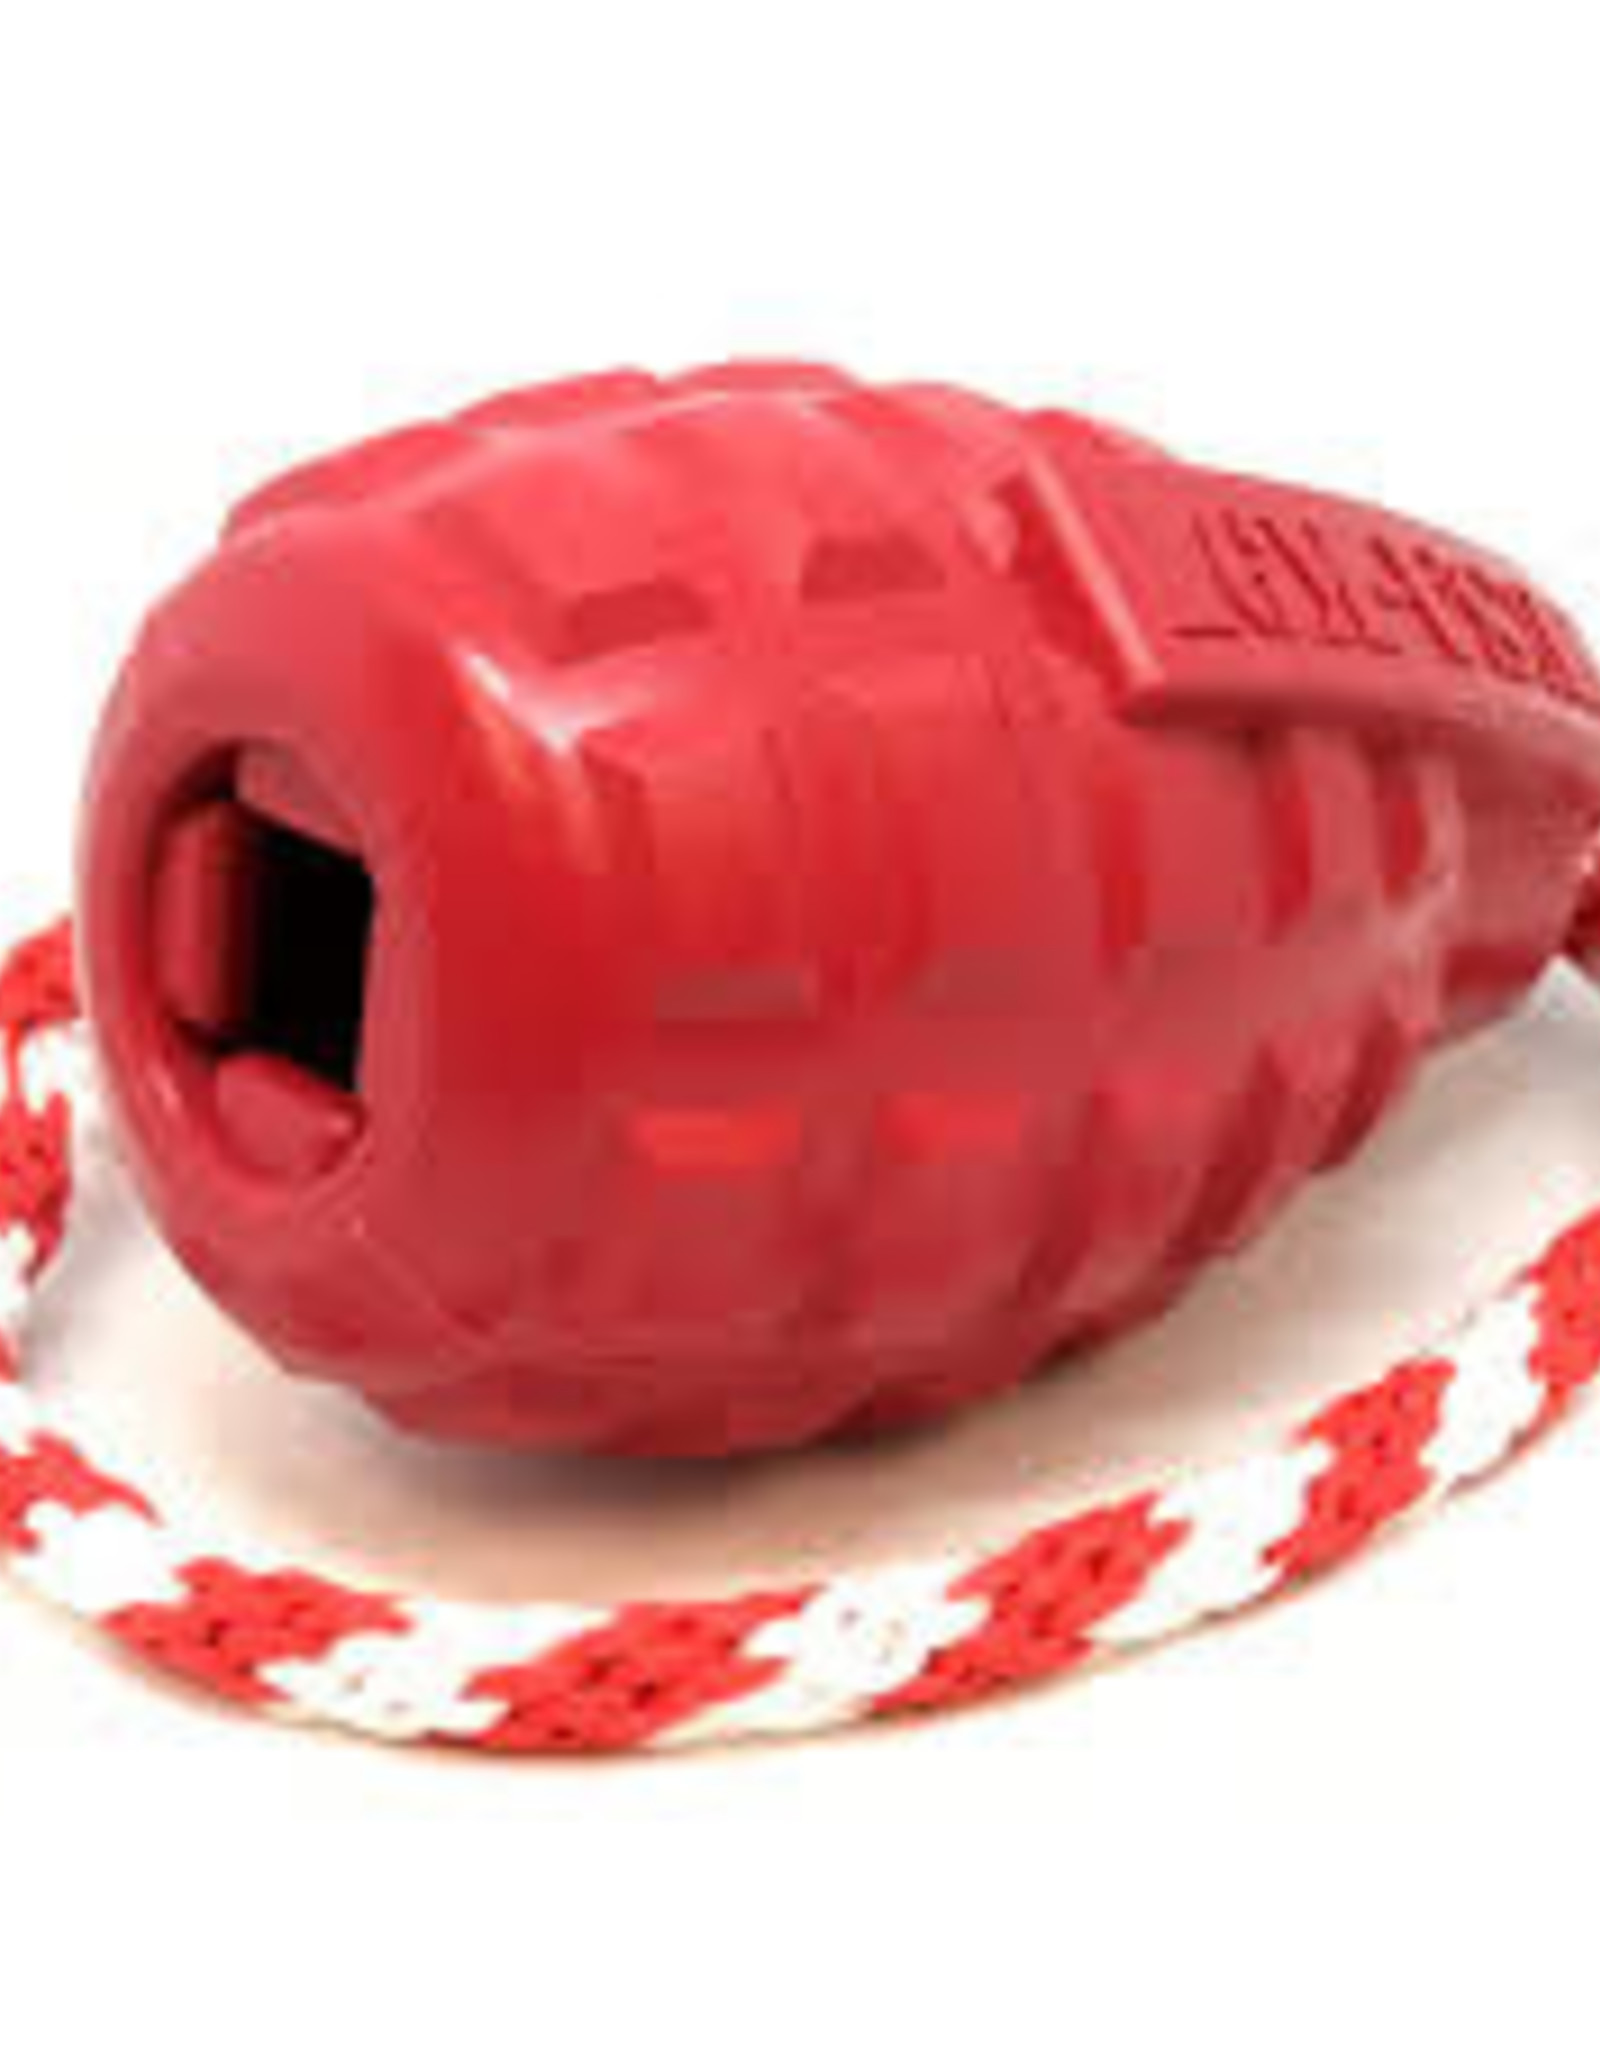 USA K9 USA K9 Grenade Chew & Reward Toy